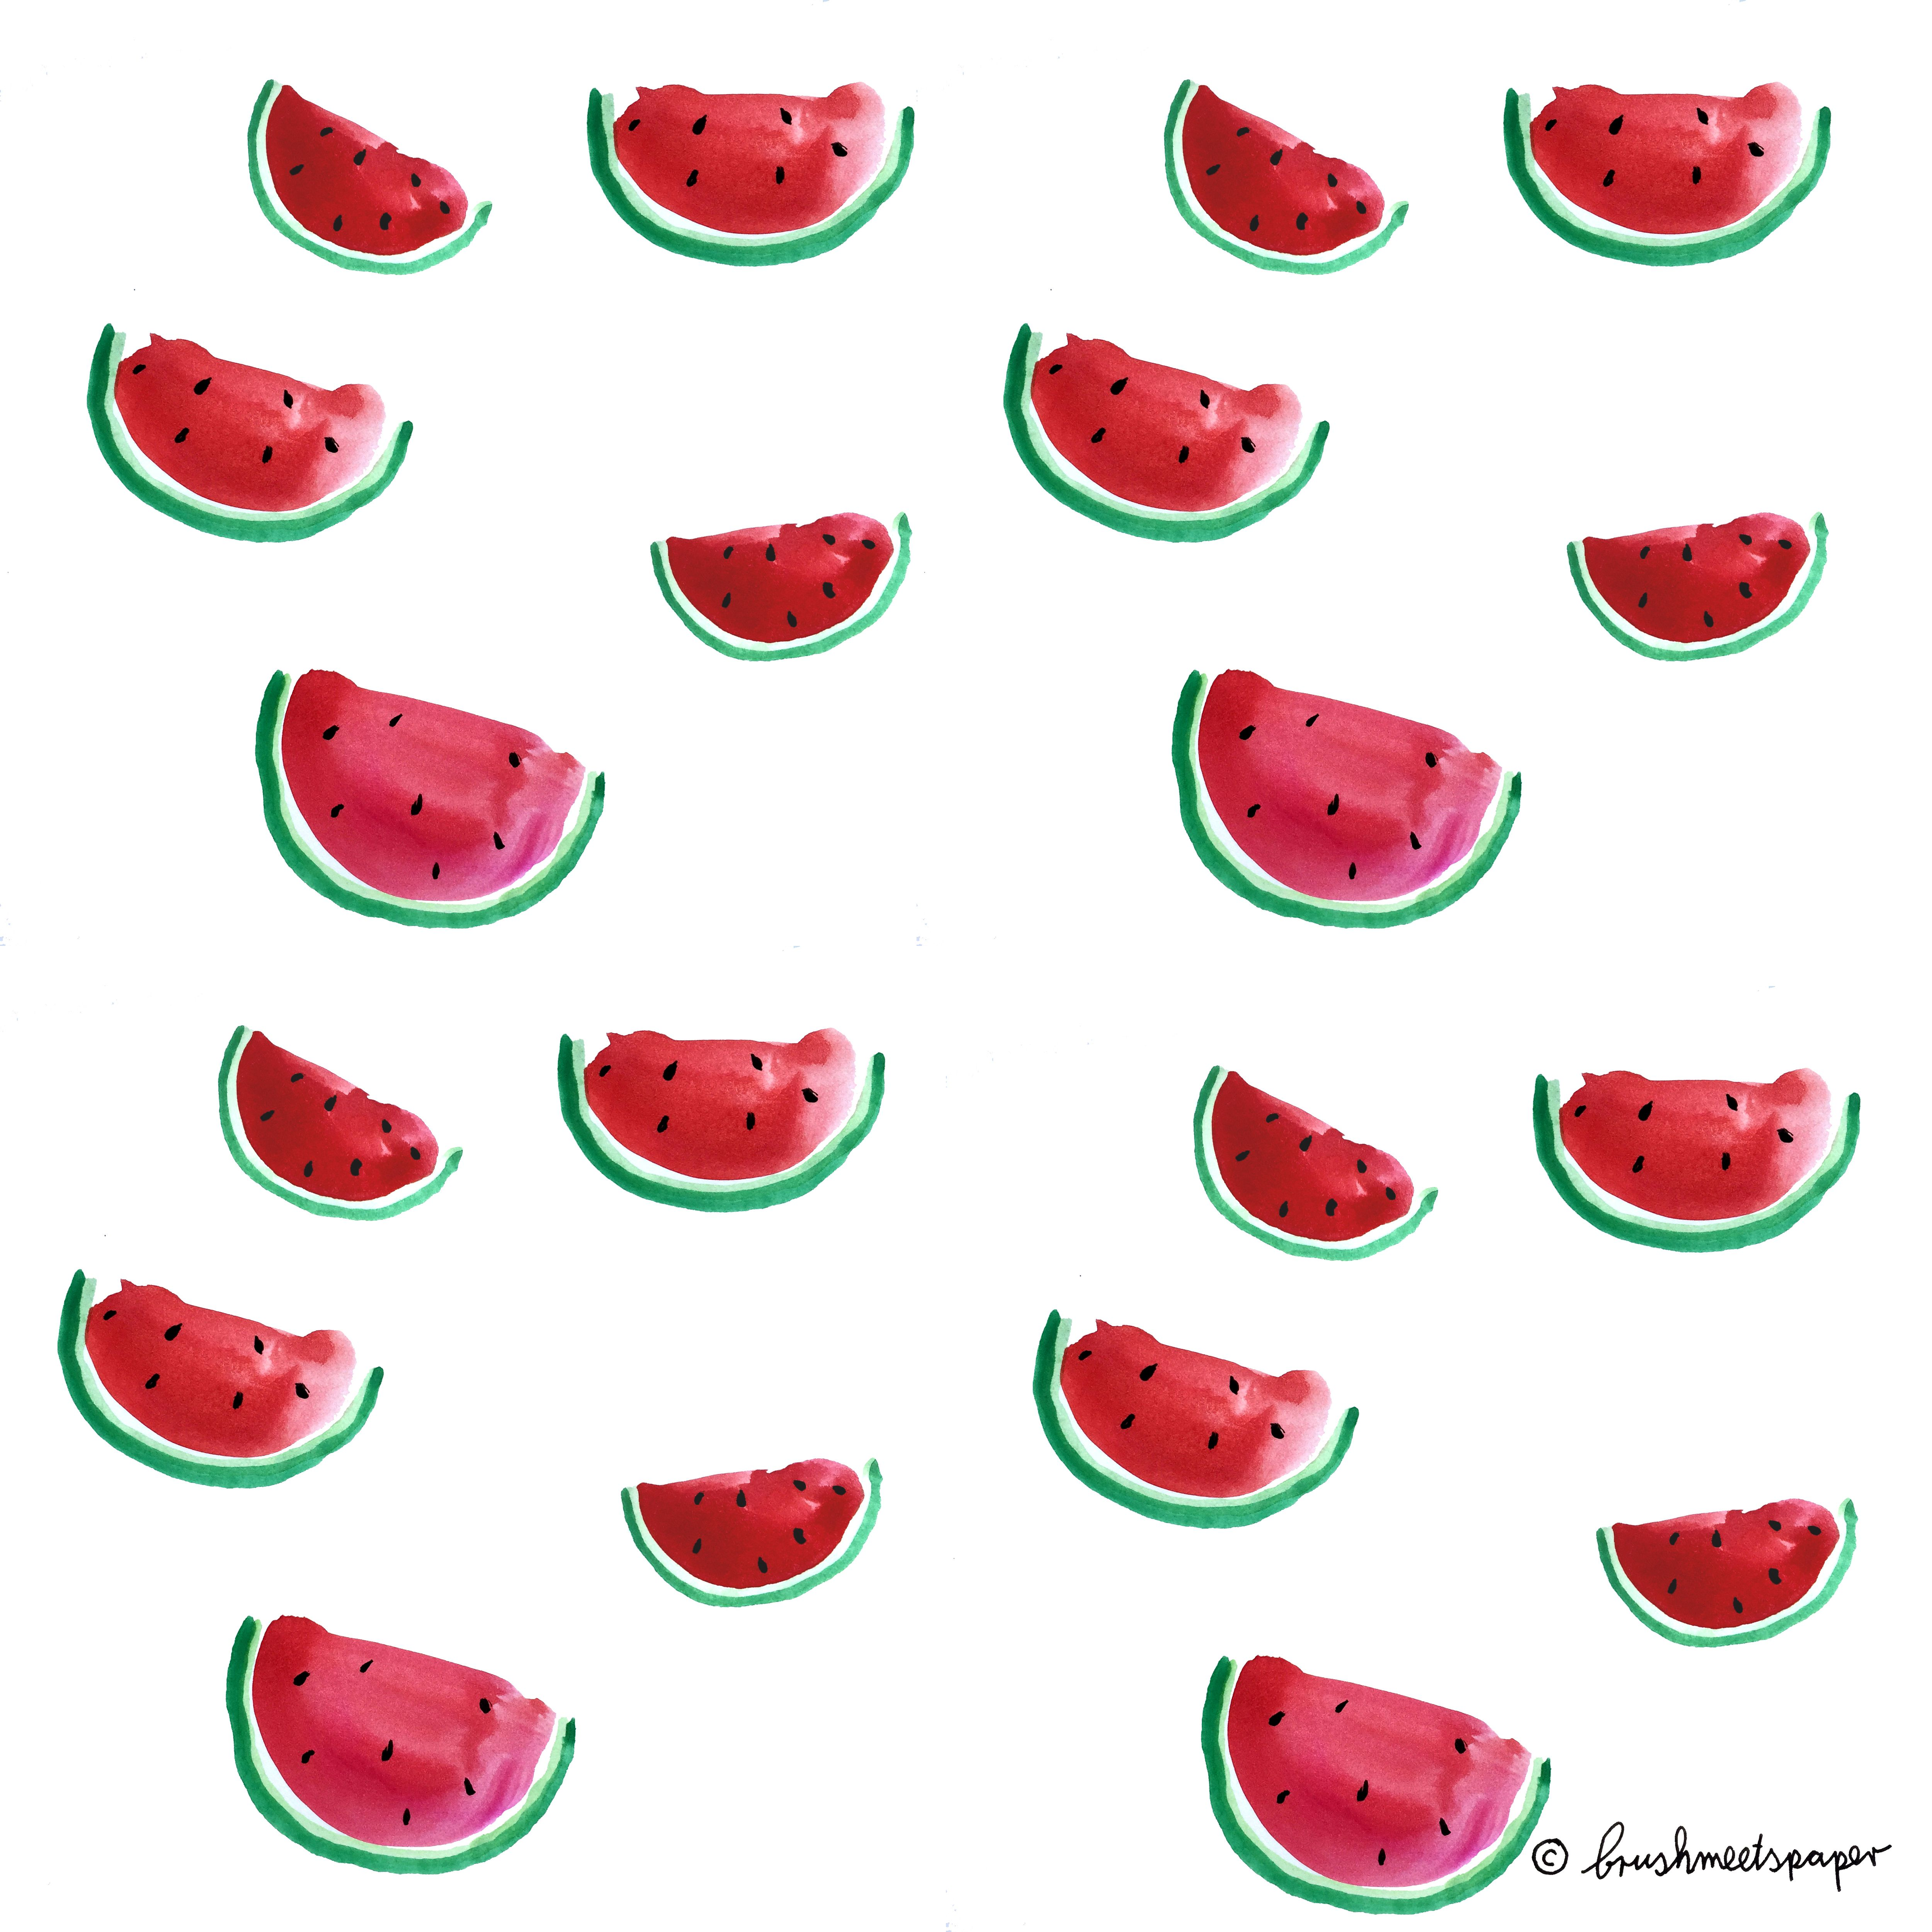 Download 1 Watermelon Watercolor Wallpaper universal (in